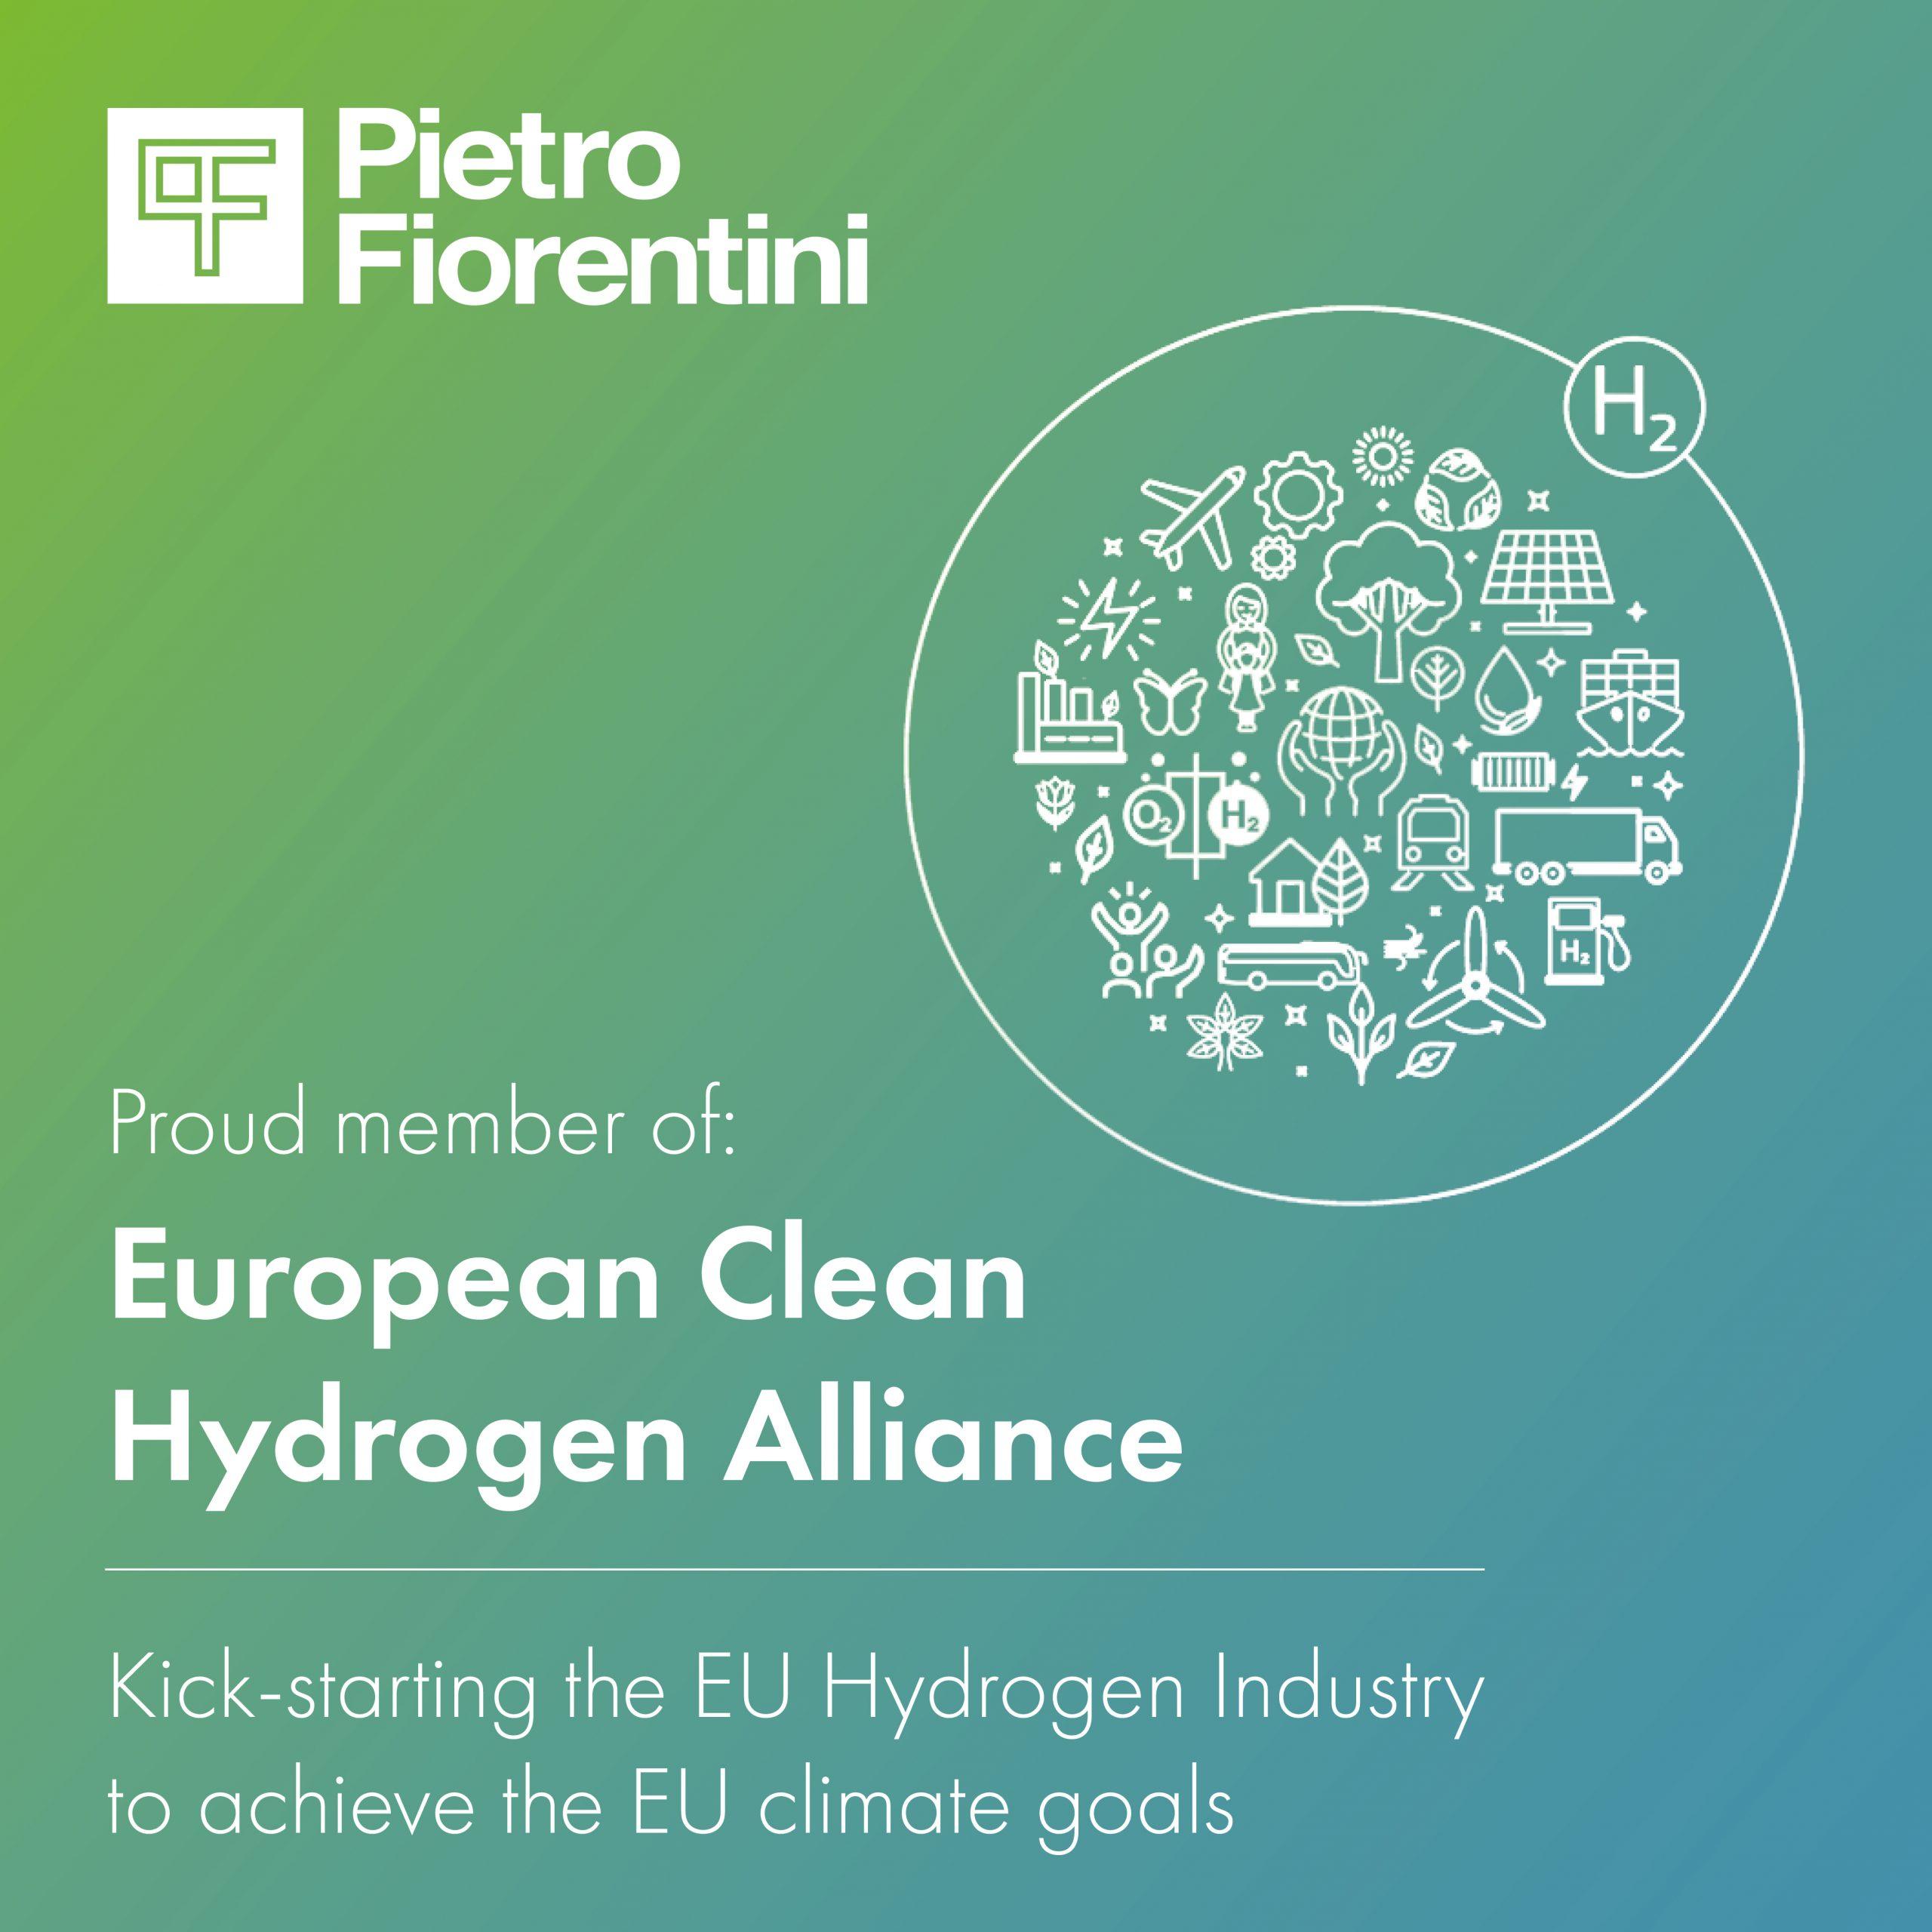 Pietro Fiorentini joins the European Clean Hydrogen Alliance